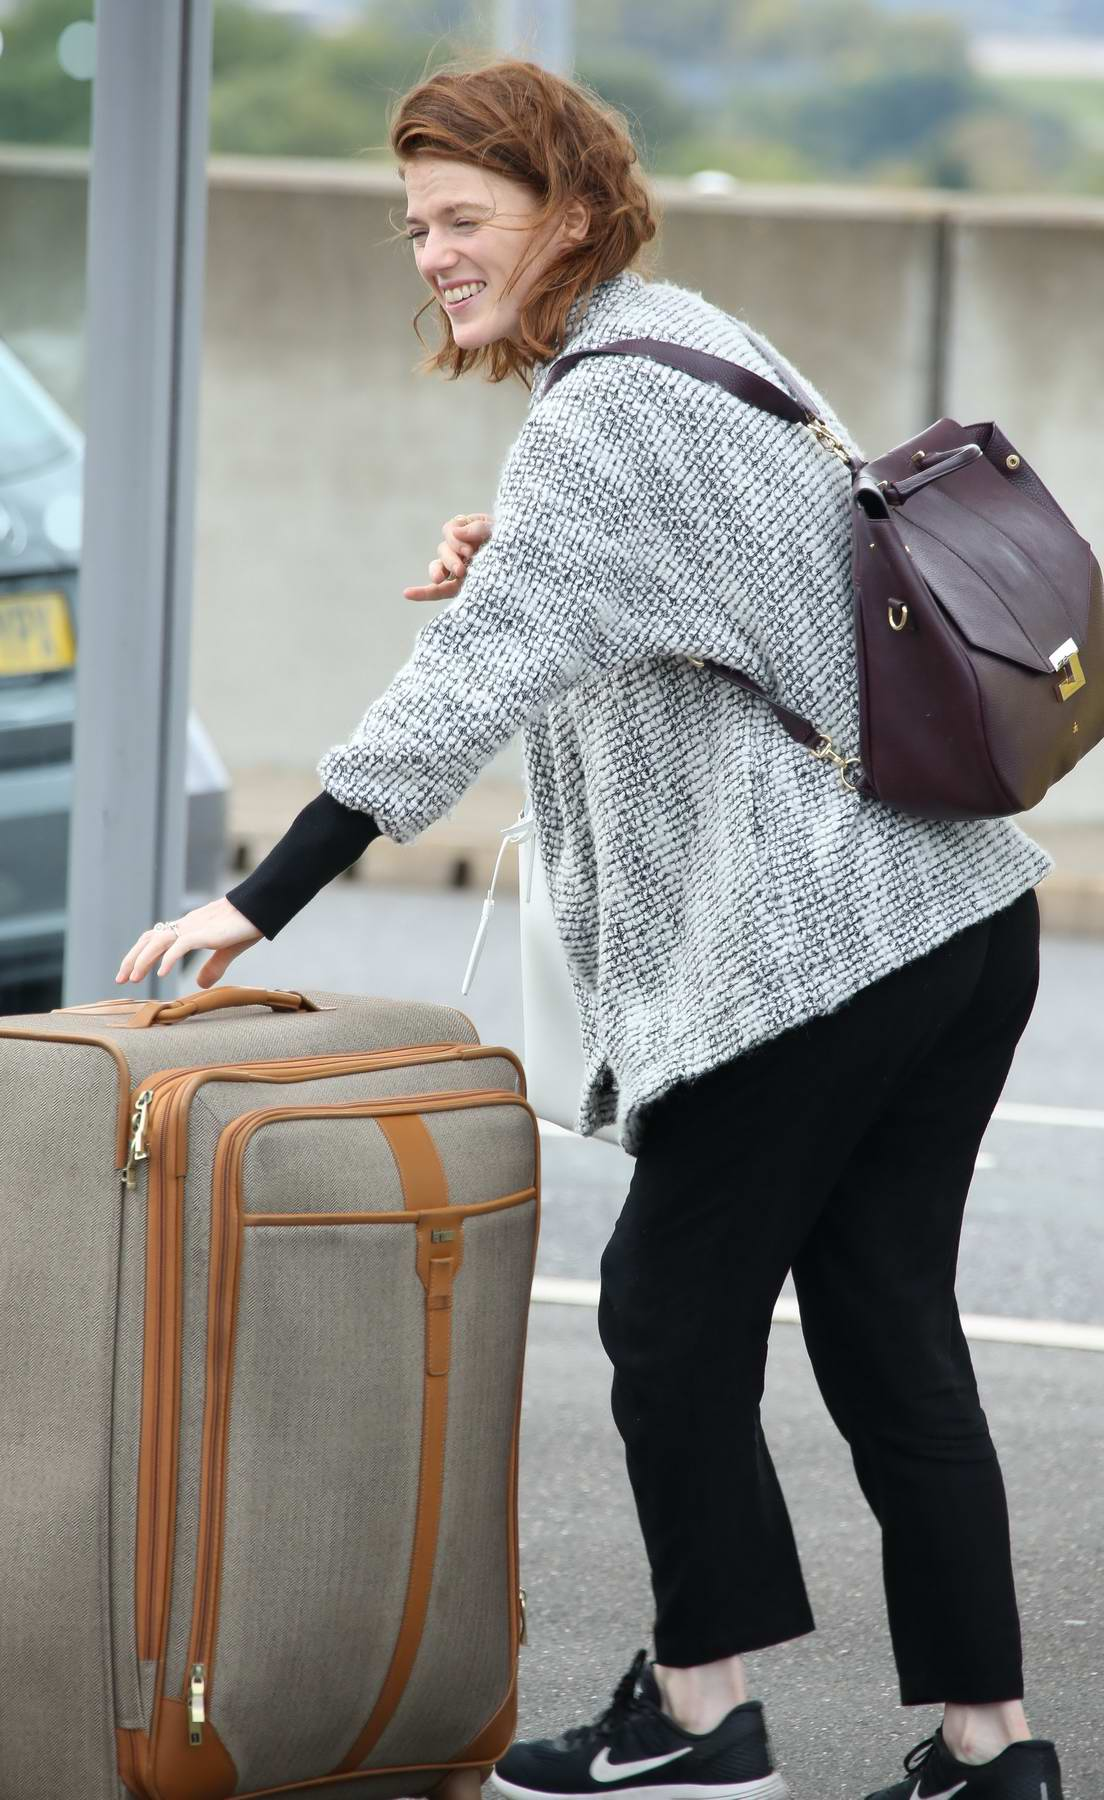 Rose Leslie arrives at Heathrow Airport in London